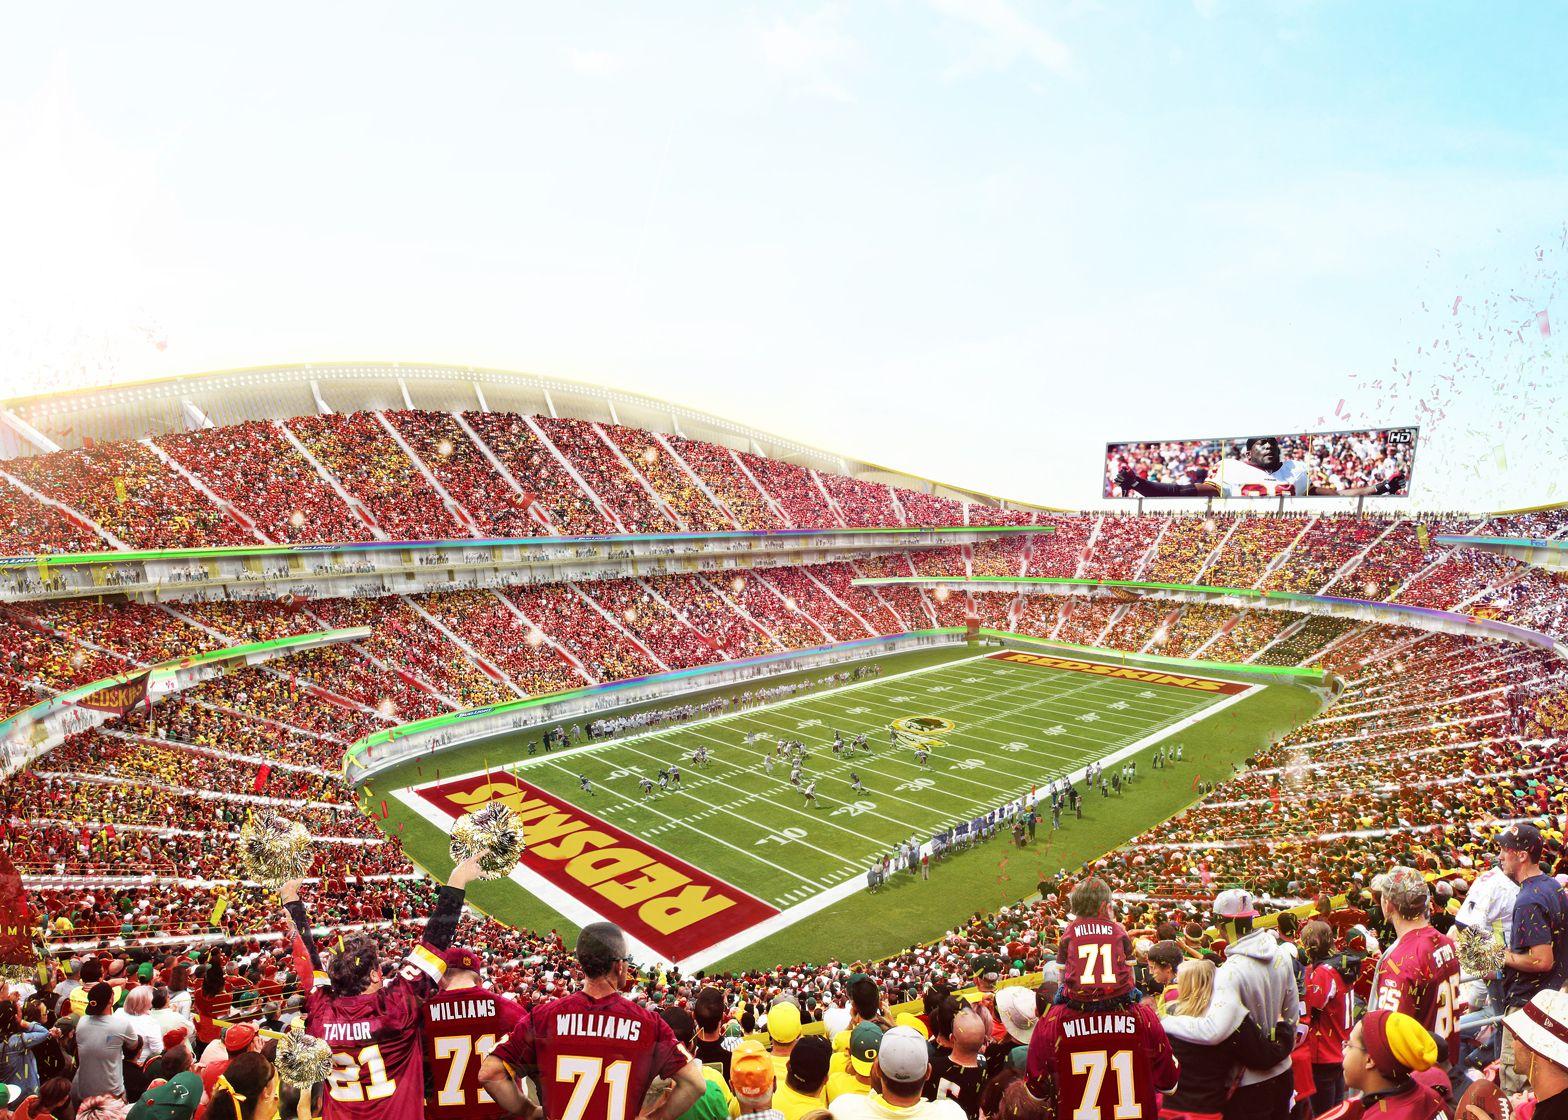 Redskins Stadium